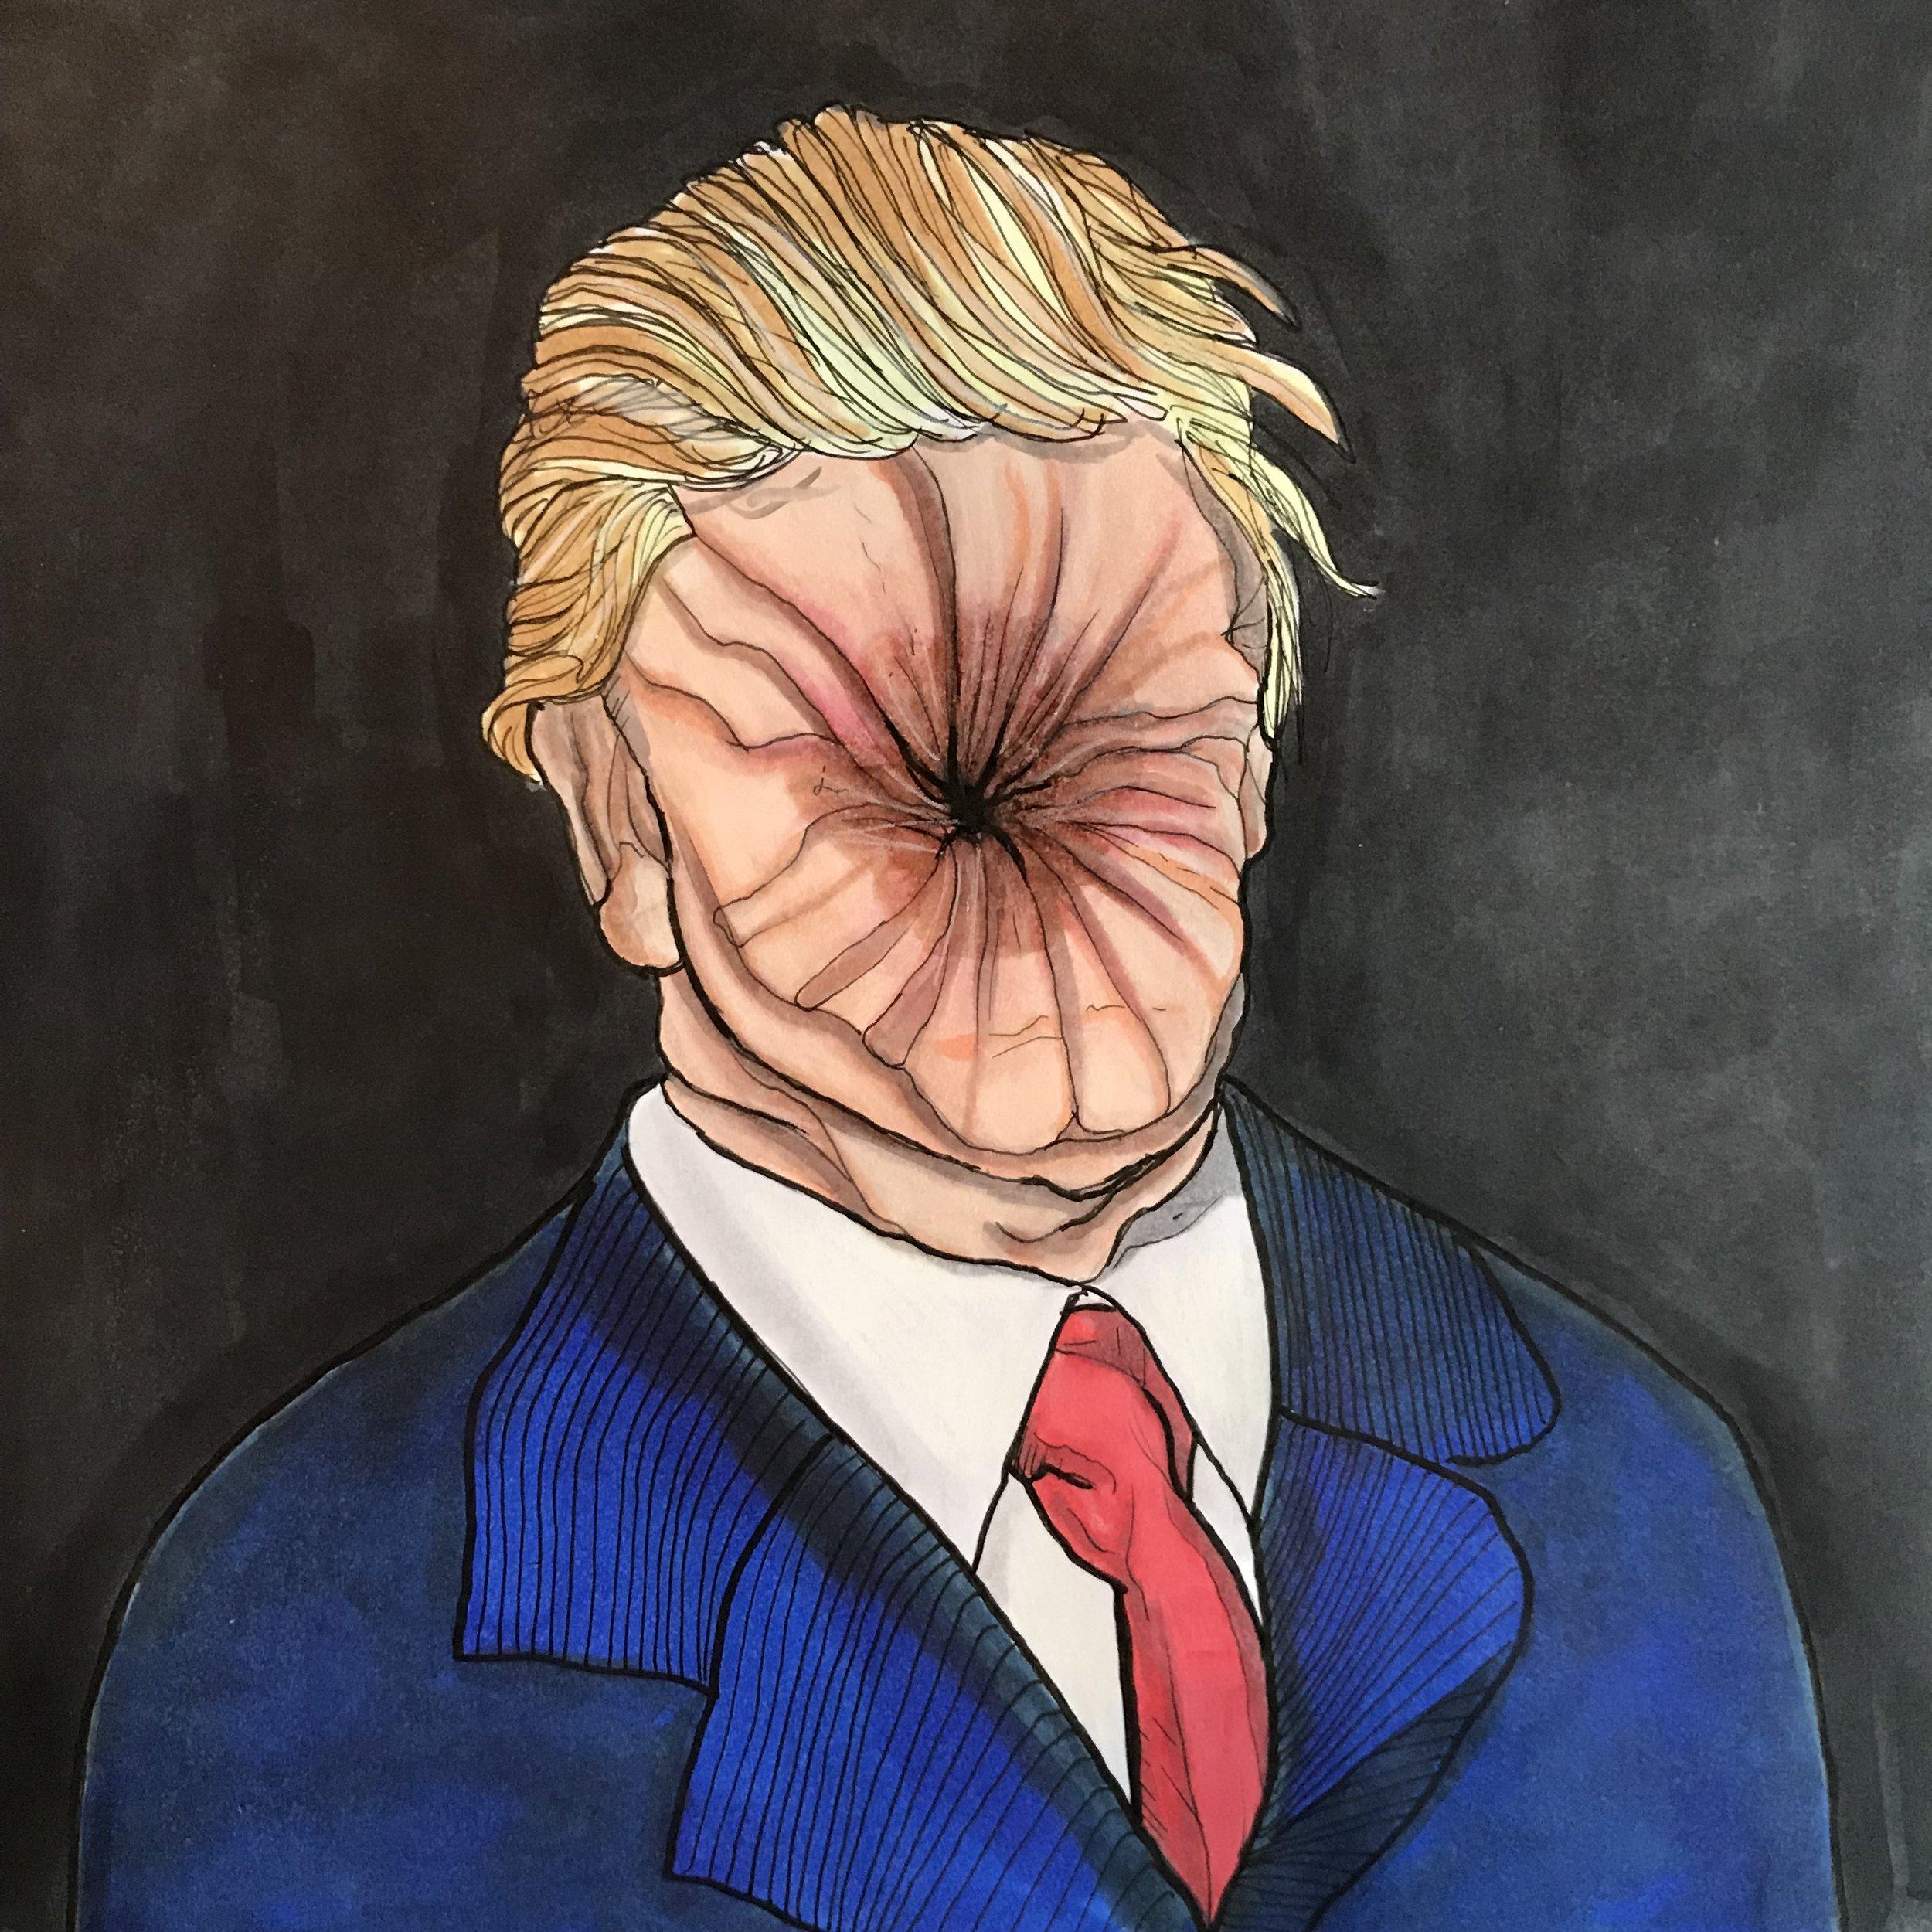 Portrait of A Real Shithole